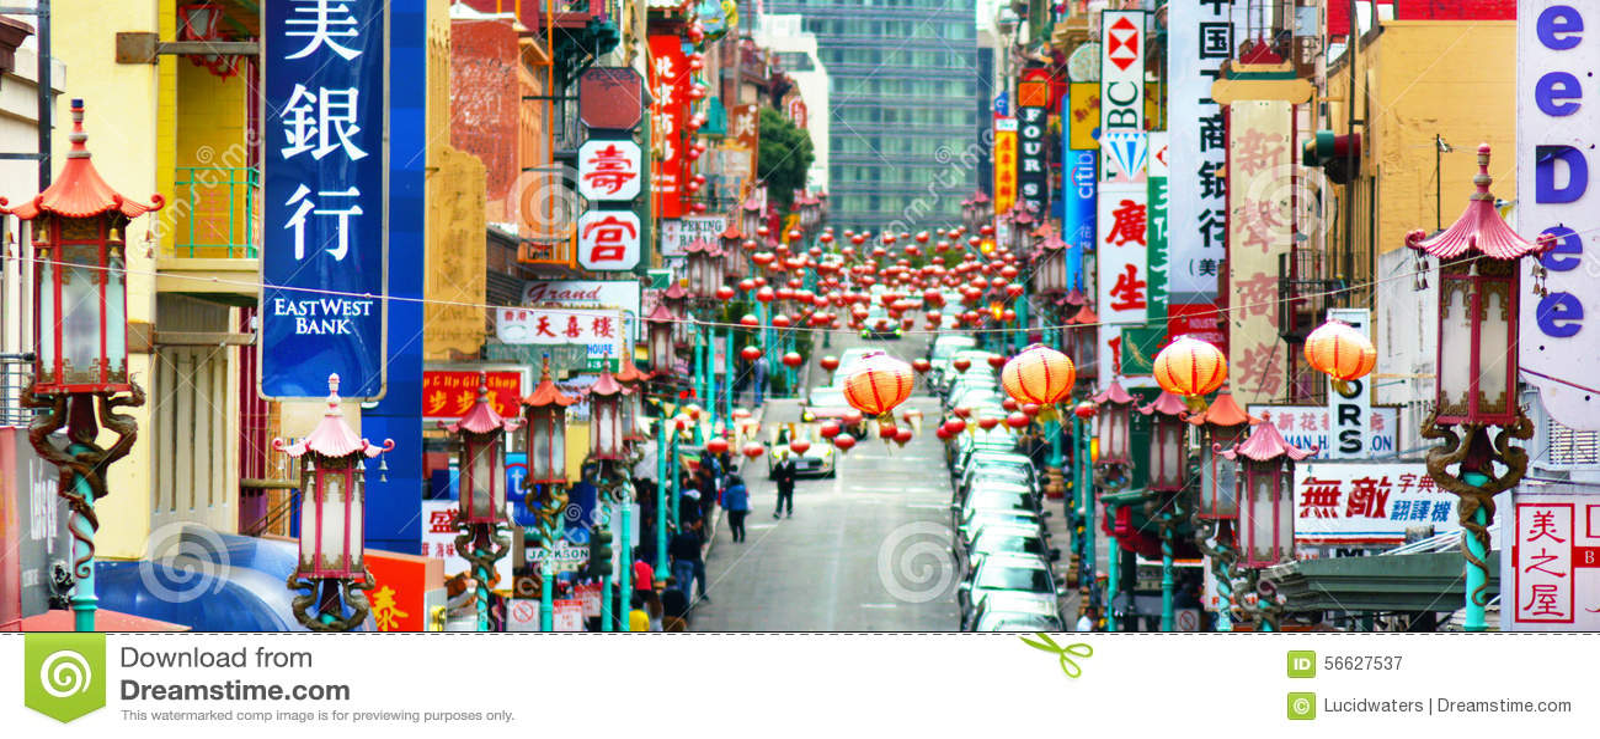 Chinatown in San Francisco California